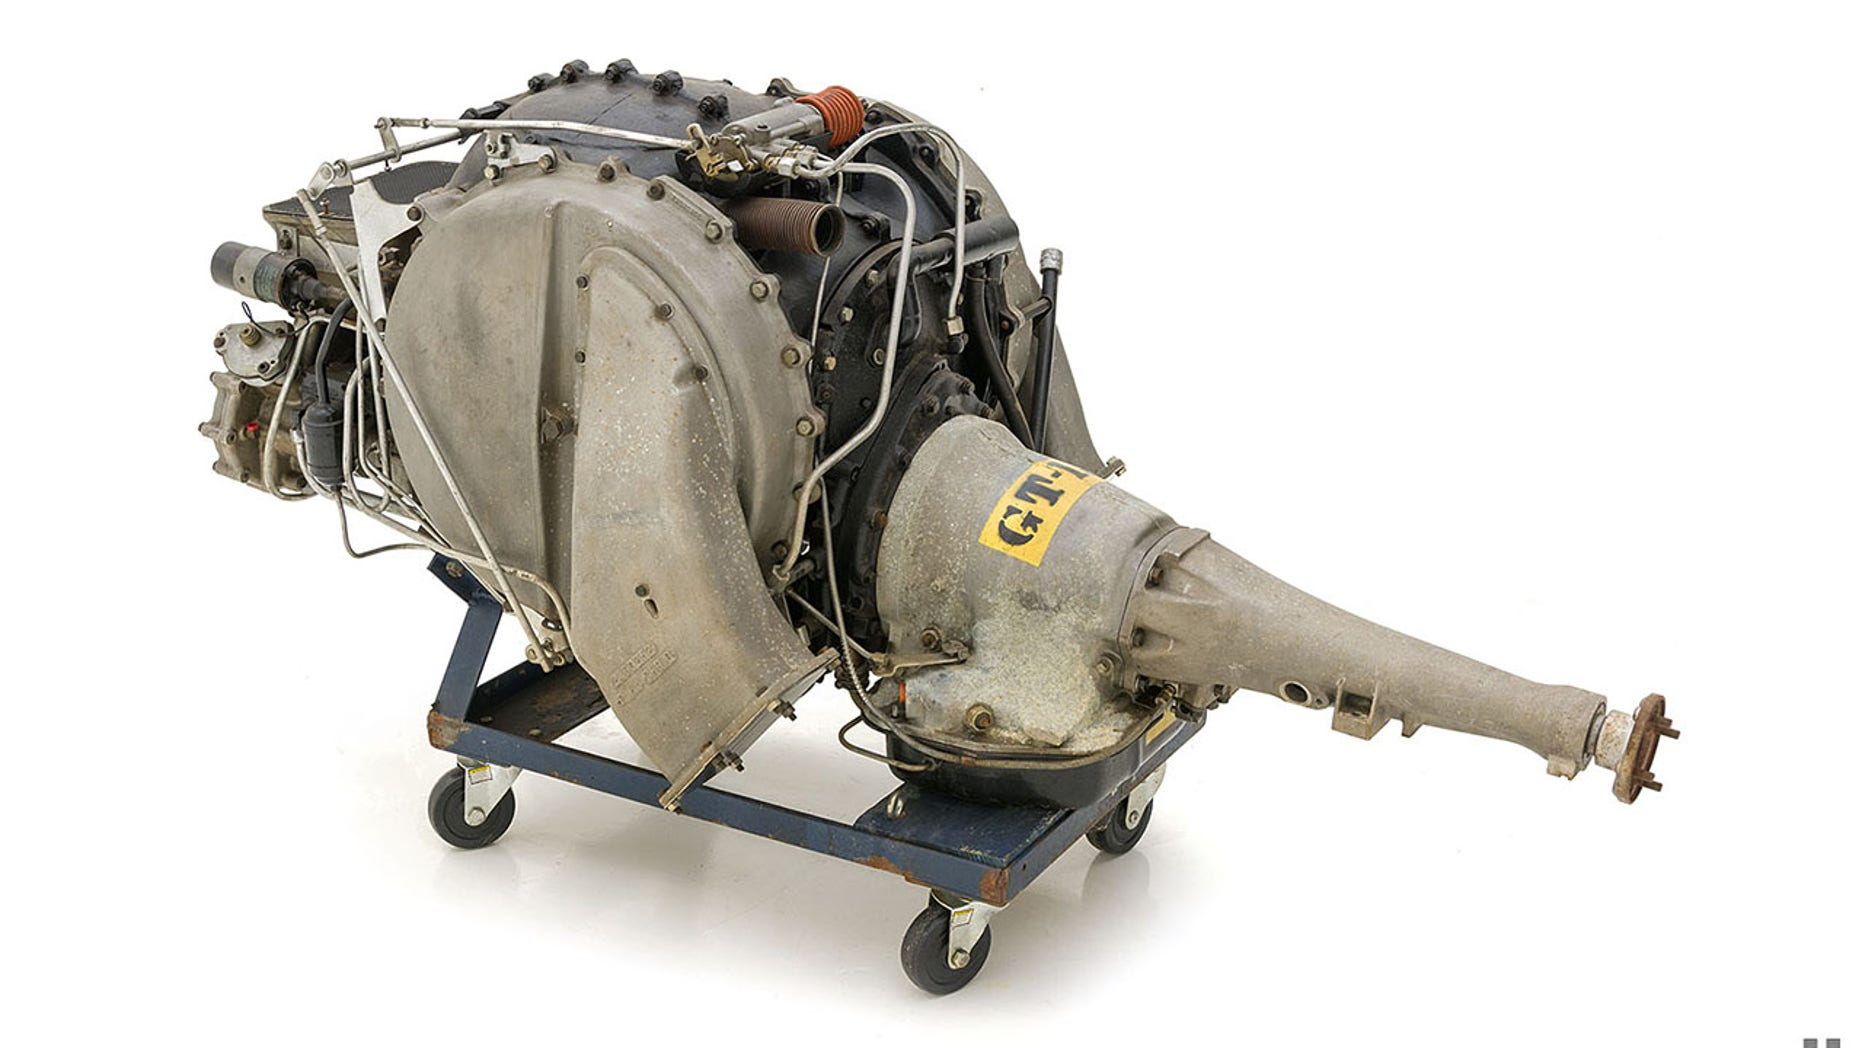 1963 Chysler Turbine engine